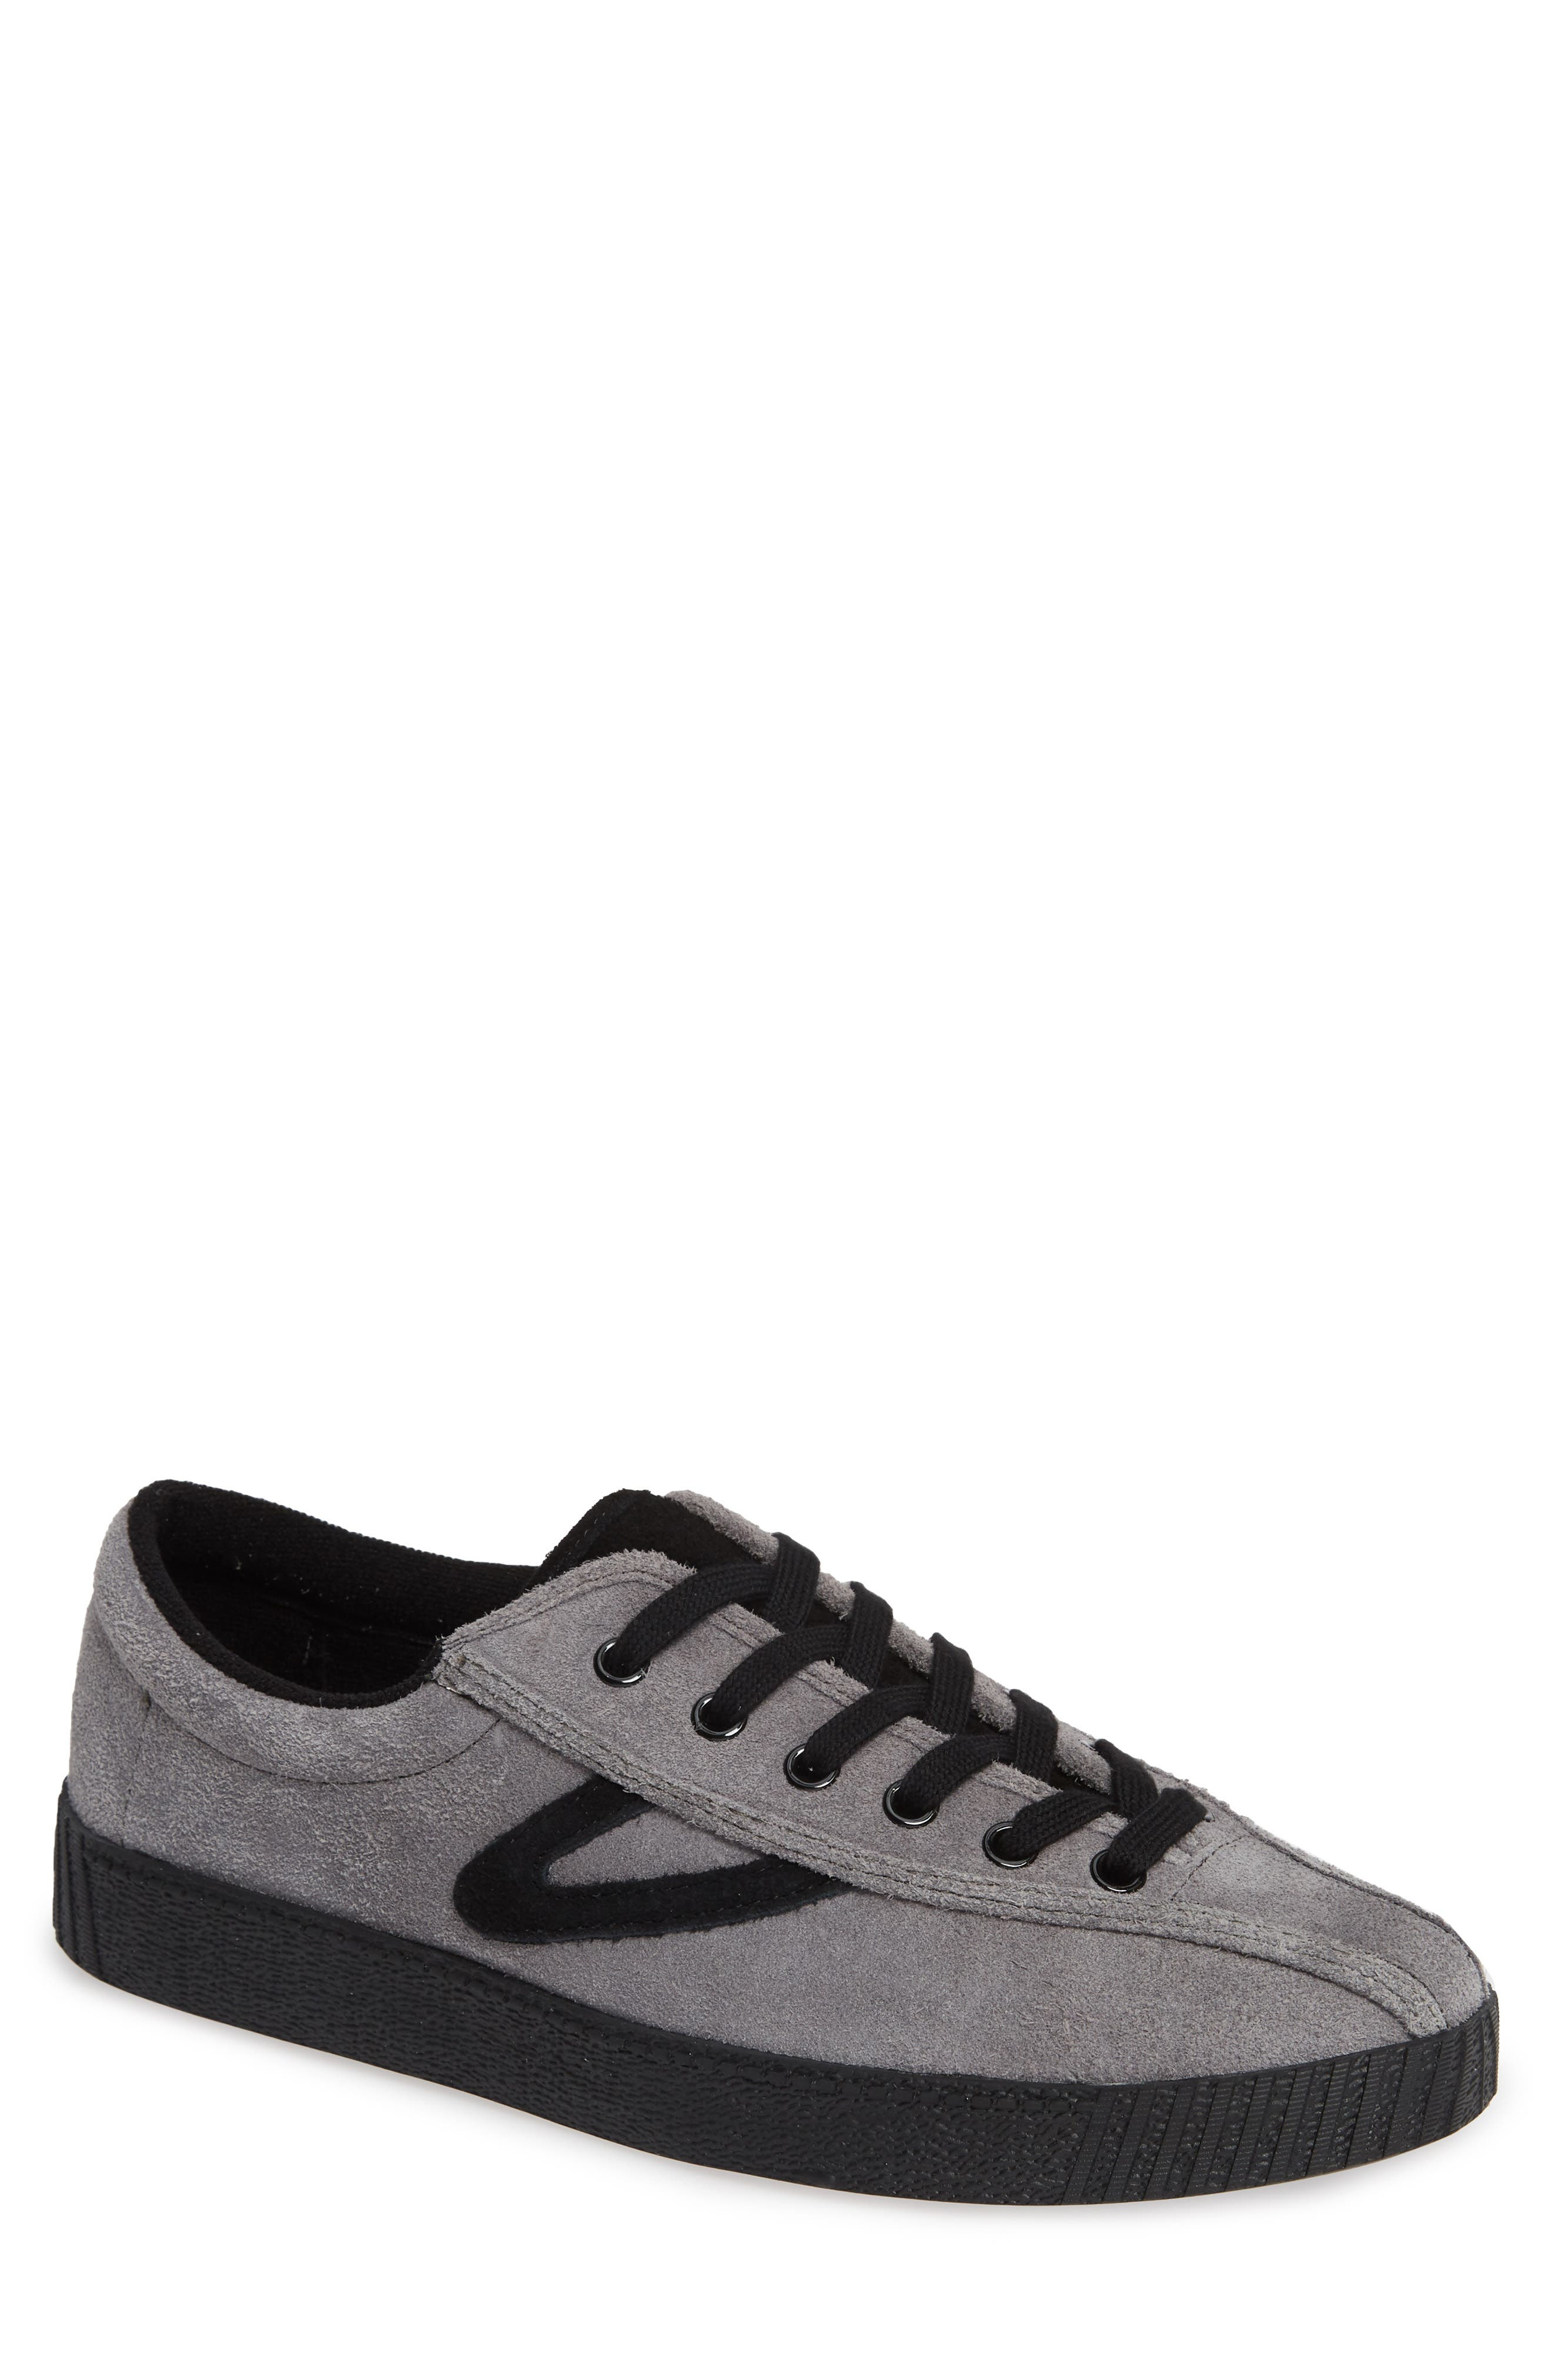 Nylite26Plus Sneaker,                             Main thumbnail 1, color,                             GRAPHITE SUEDE